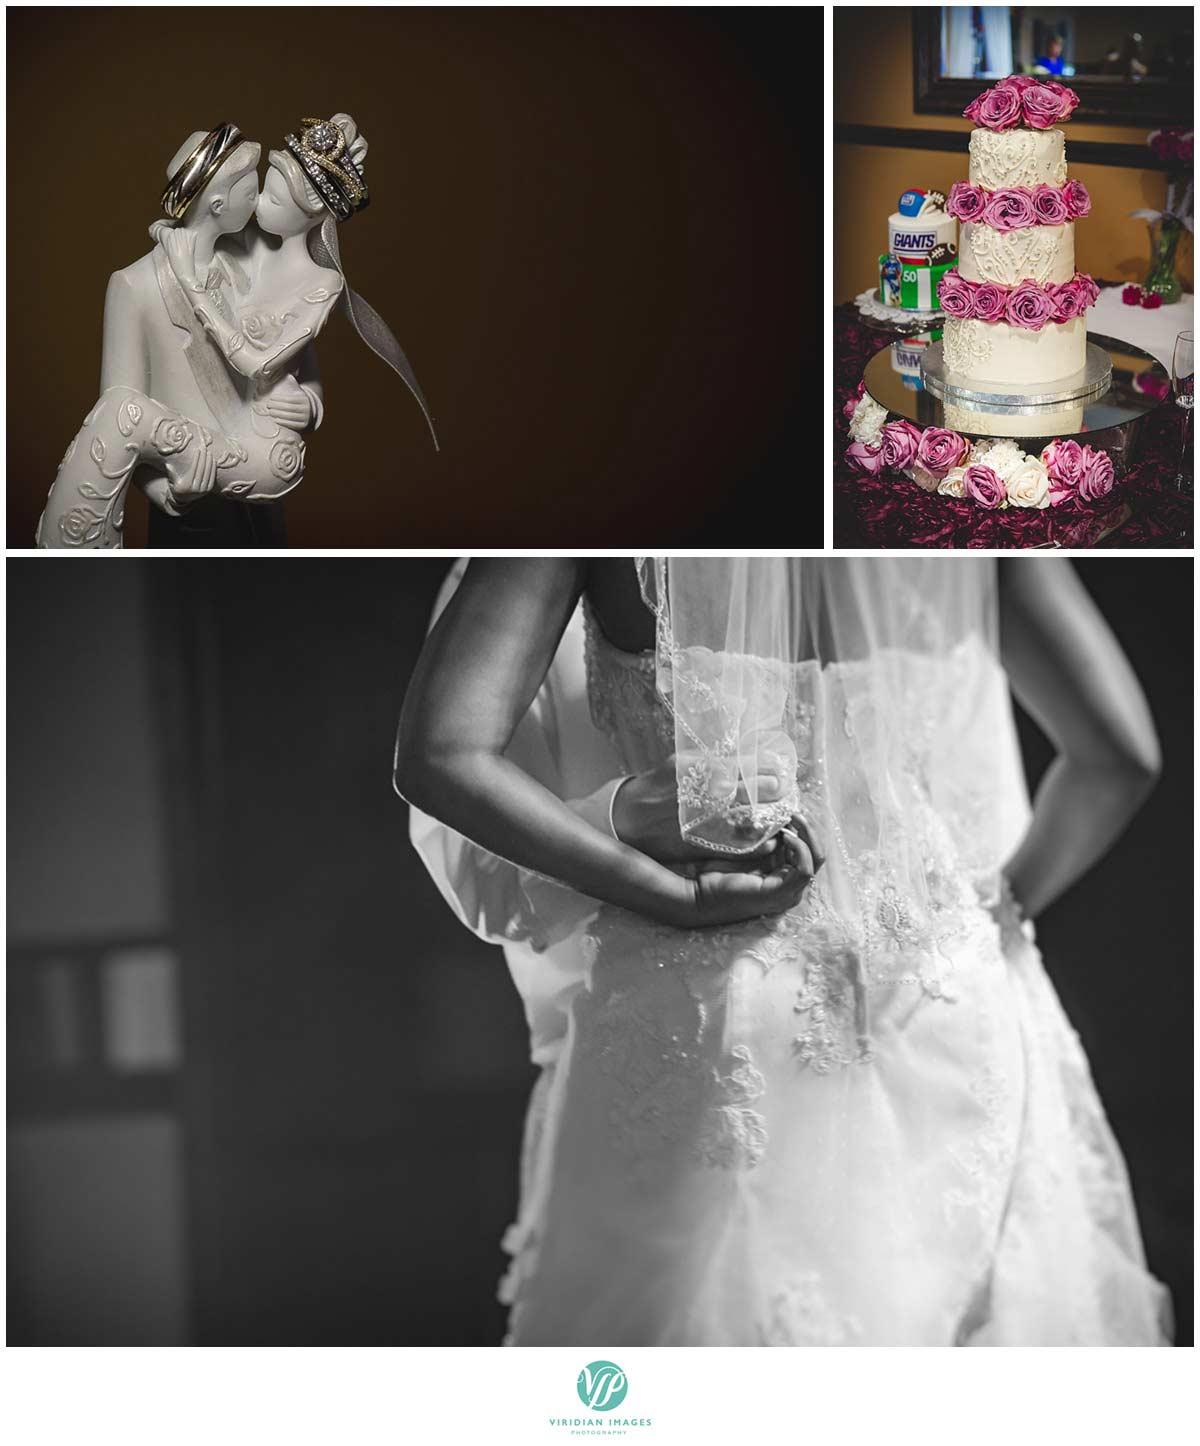 Atlanta-wedding-photographers-reception-dance-ring-cake-interracial-photo-12